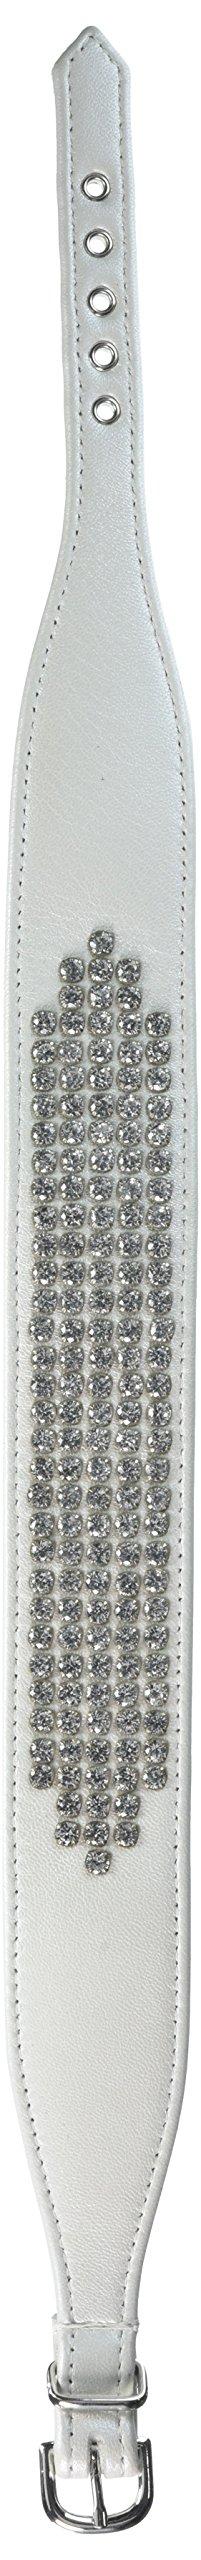 Evans Collars 20'' Lambskin Empress Rhodium Collar, XX-Large, Pearlized